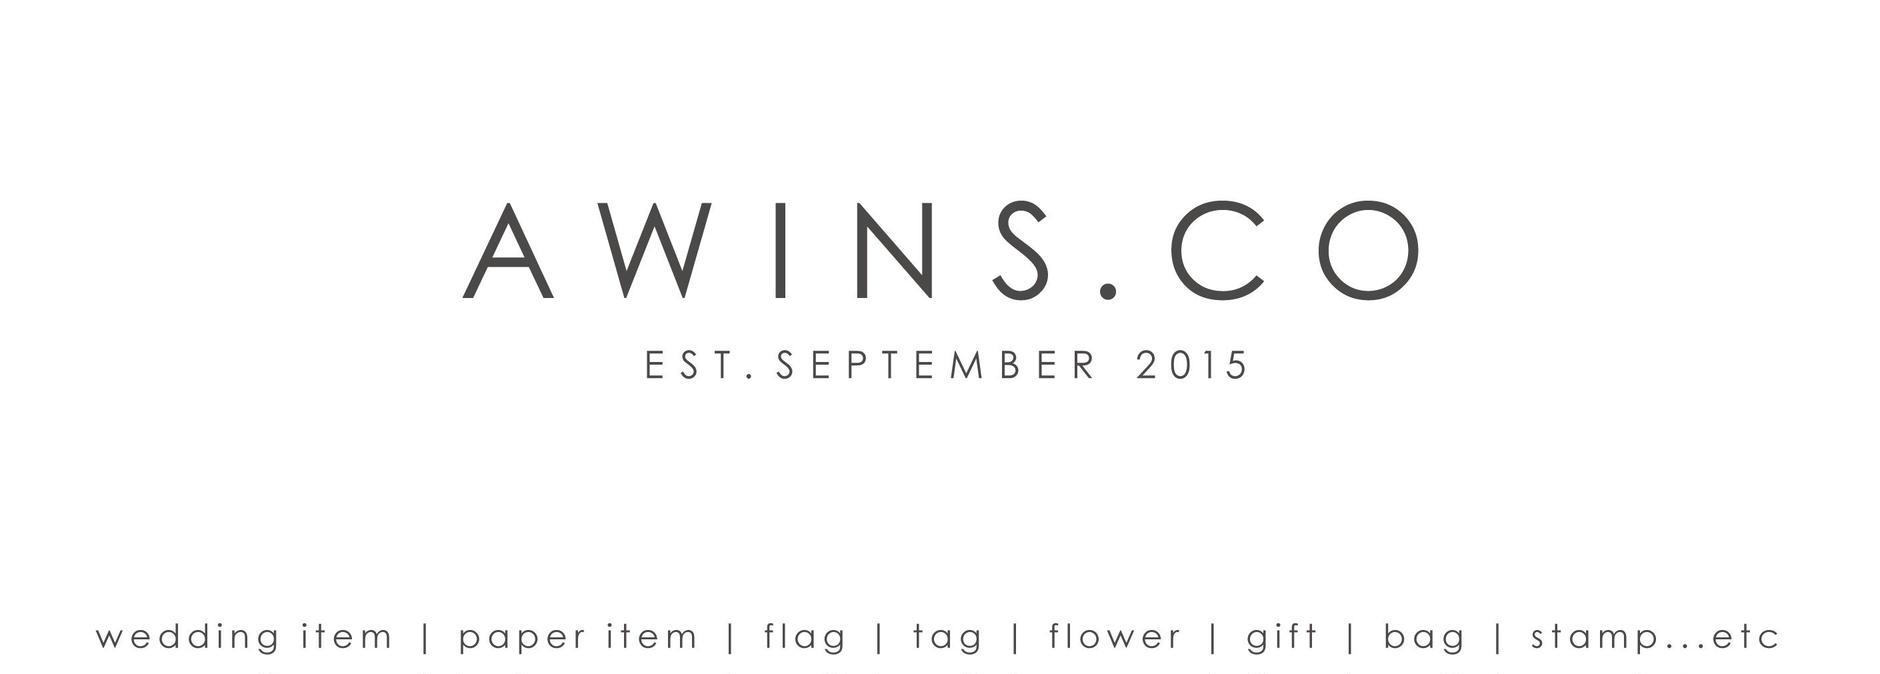 AWINS.CO